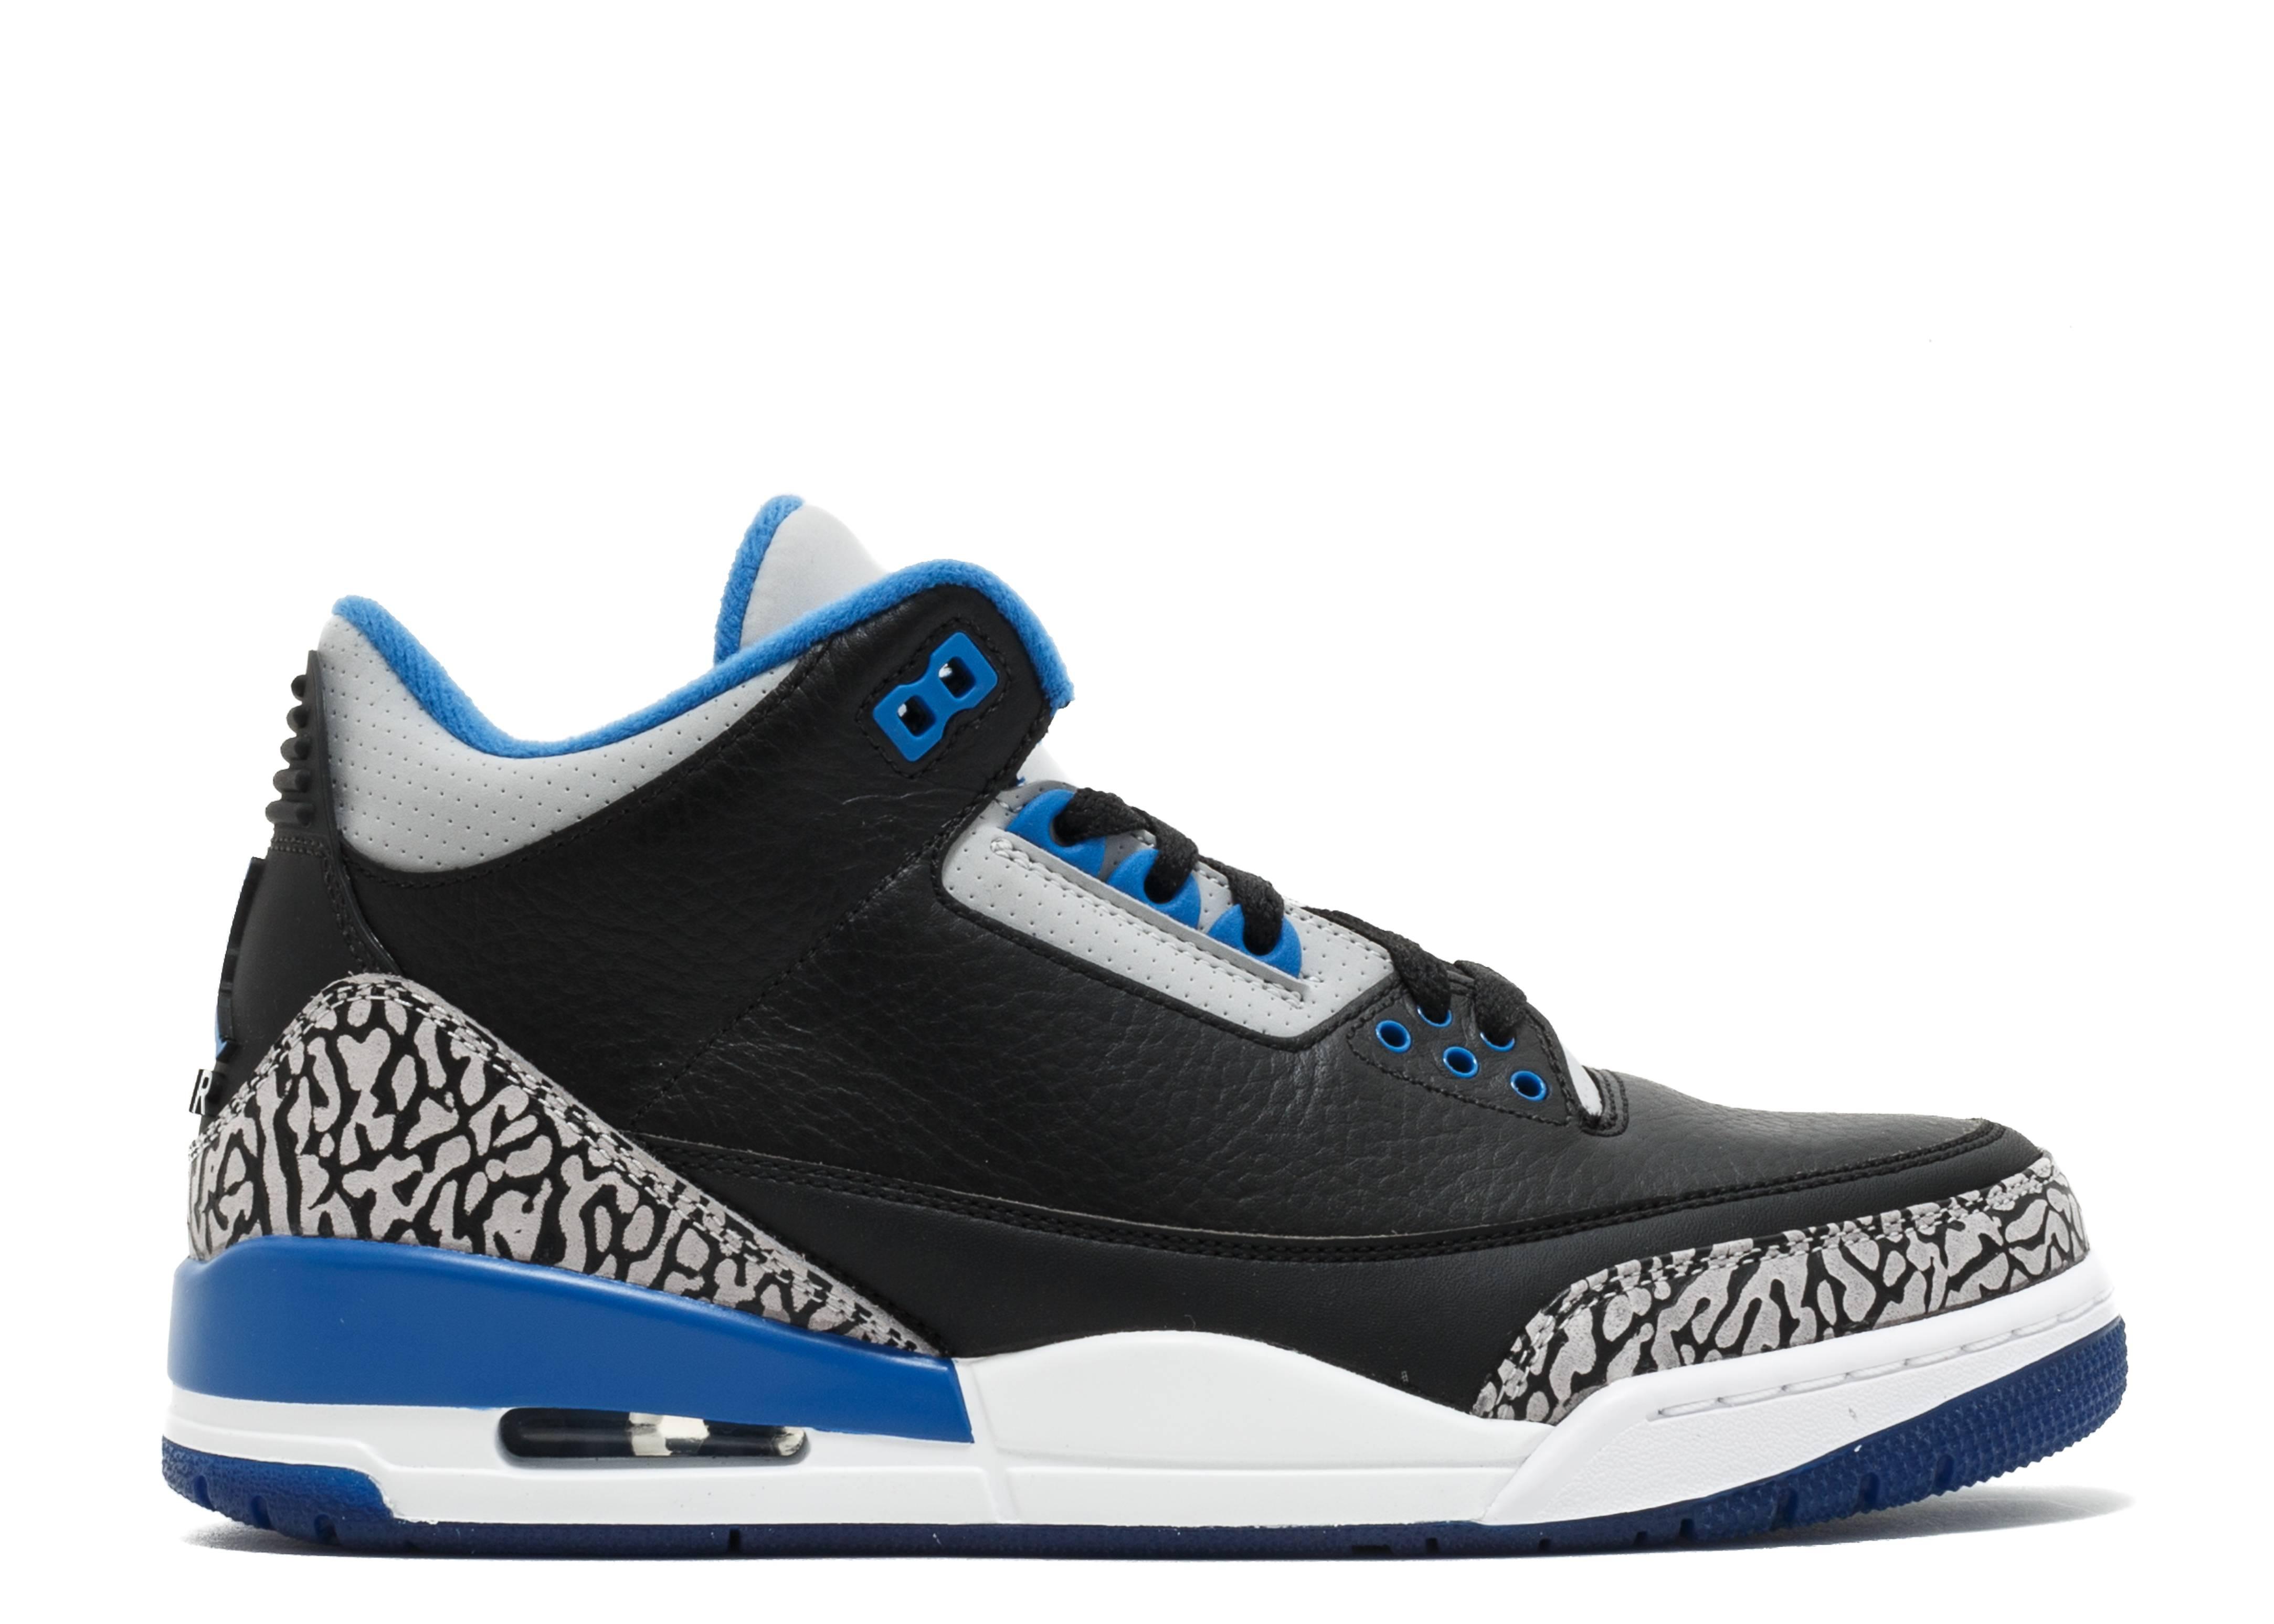 newest a782b 93a30 Air Jordan 3 (III) Shoes - Nike   Flight Club